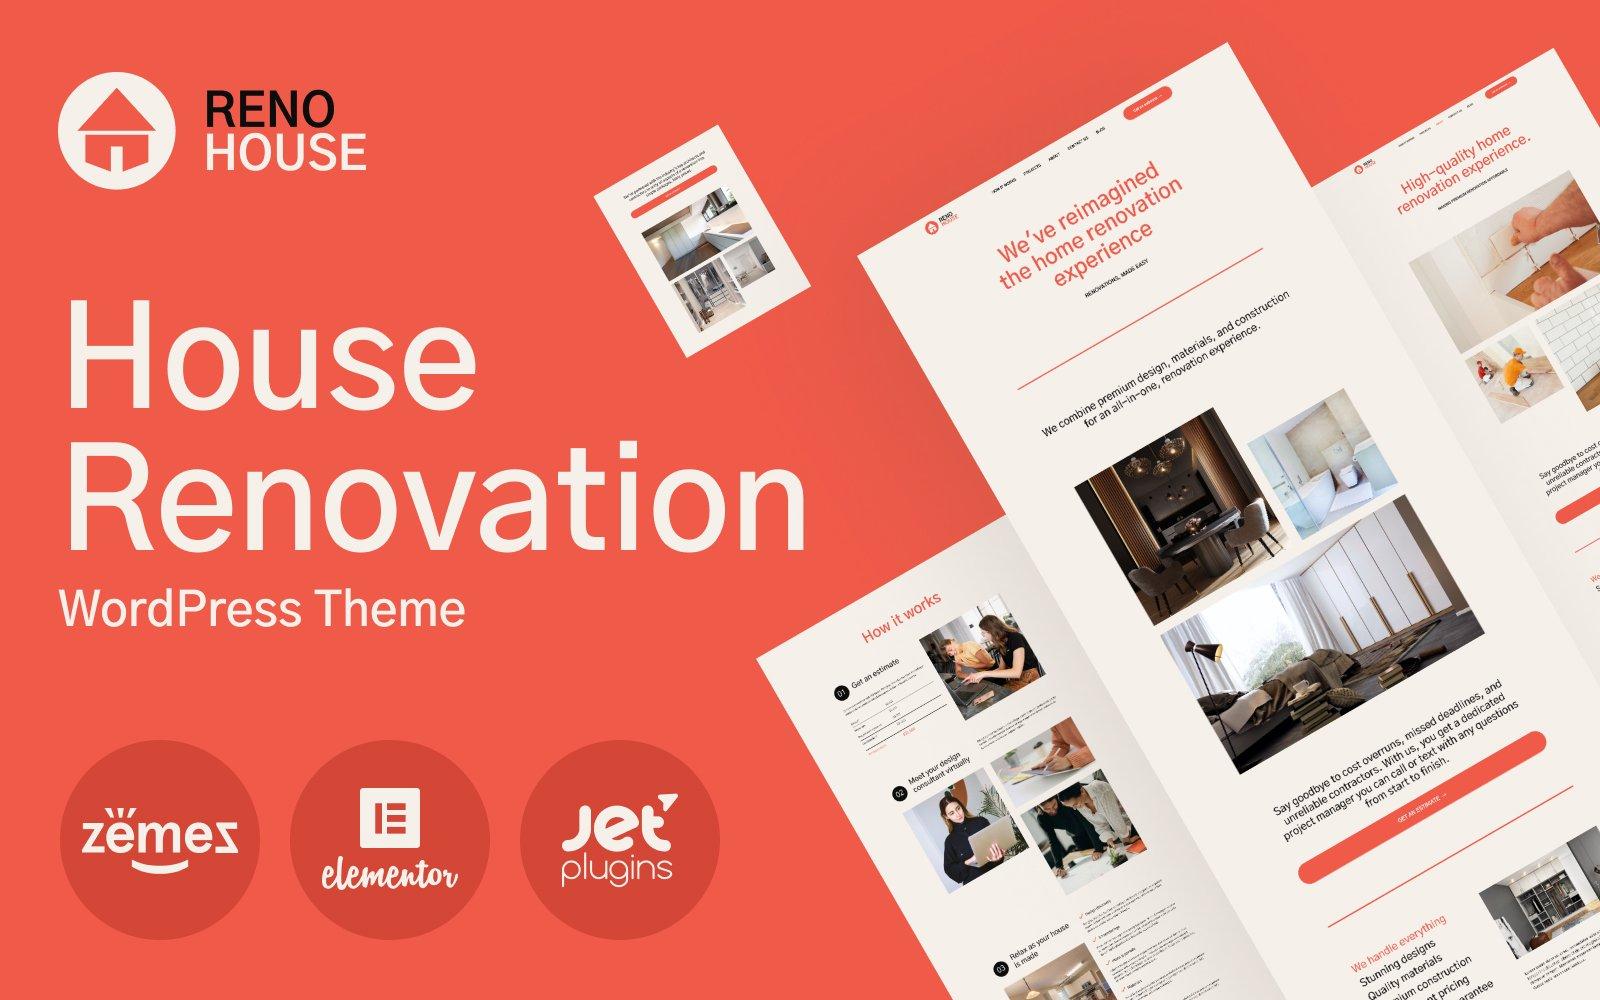 RenoHouse - Modern Construction Project Website WordPress Theme